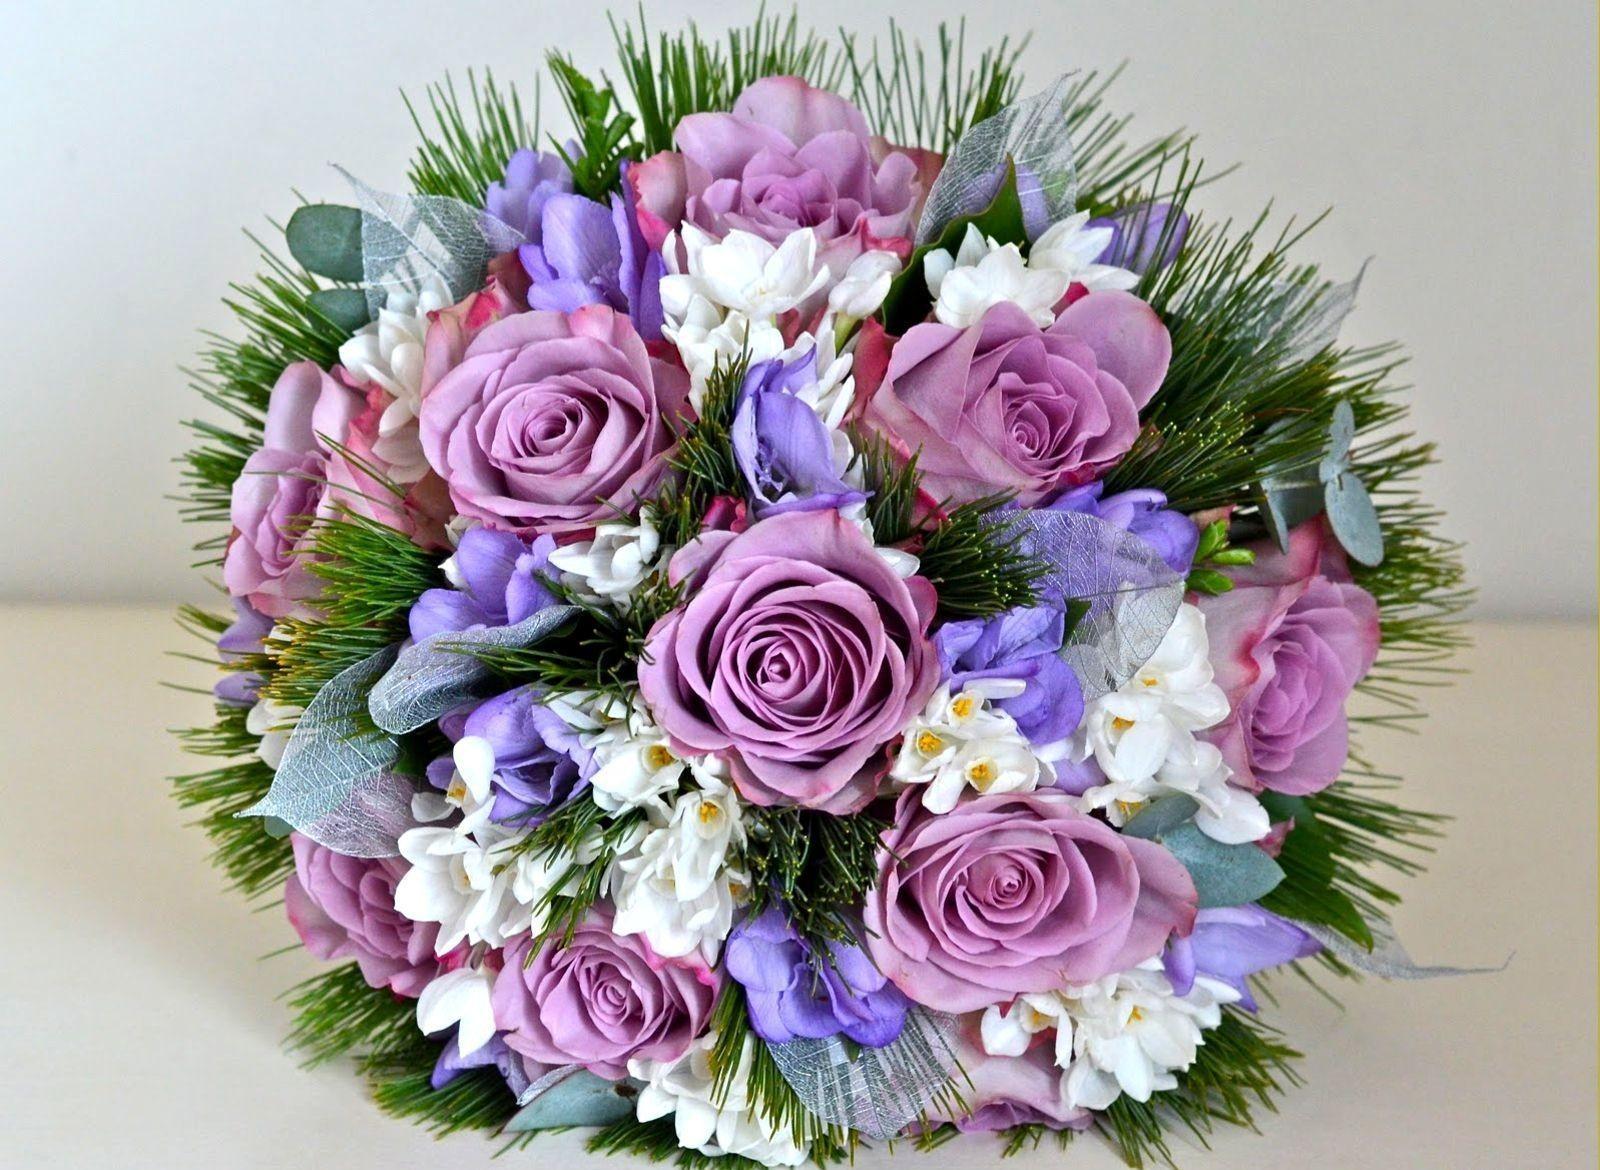 hintergrundbilder lila gr n blume dekoration rosen strau bl tenblatt verkauf sch n. Black Bedroom Furniture Sets. Home Design Ideas